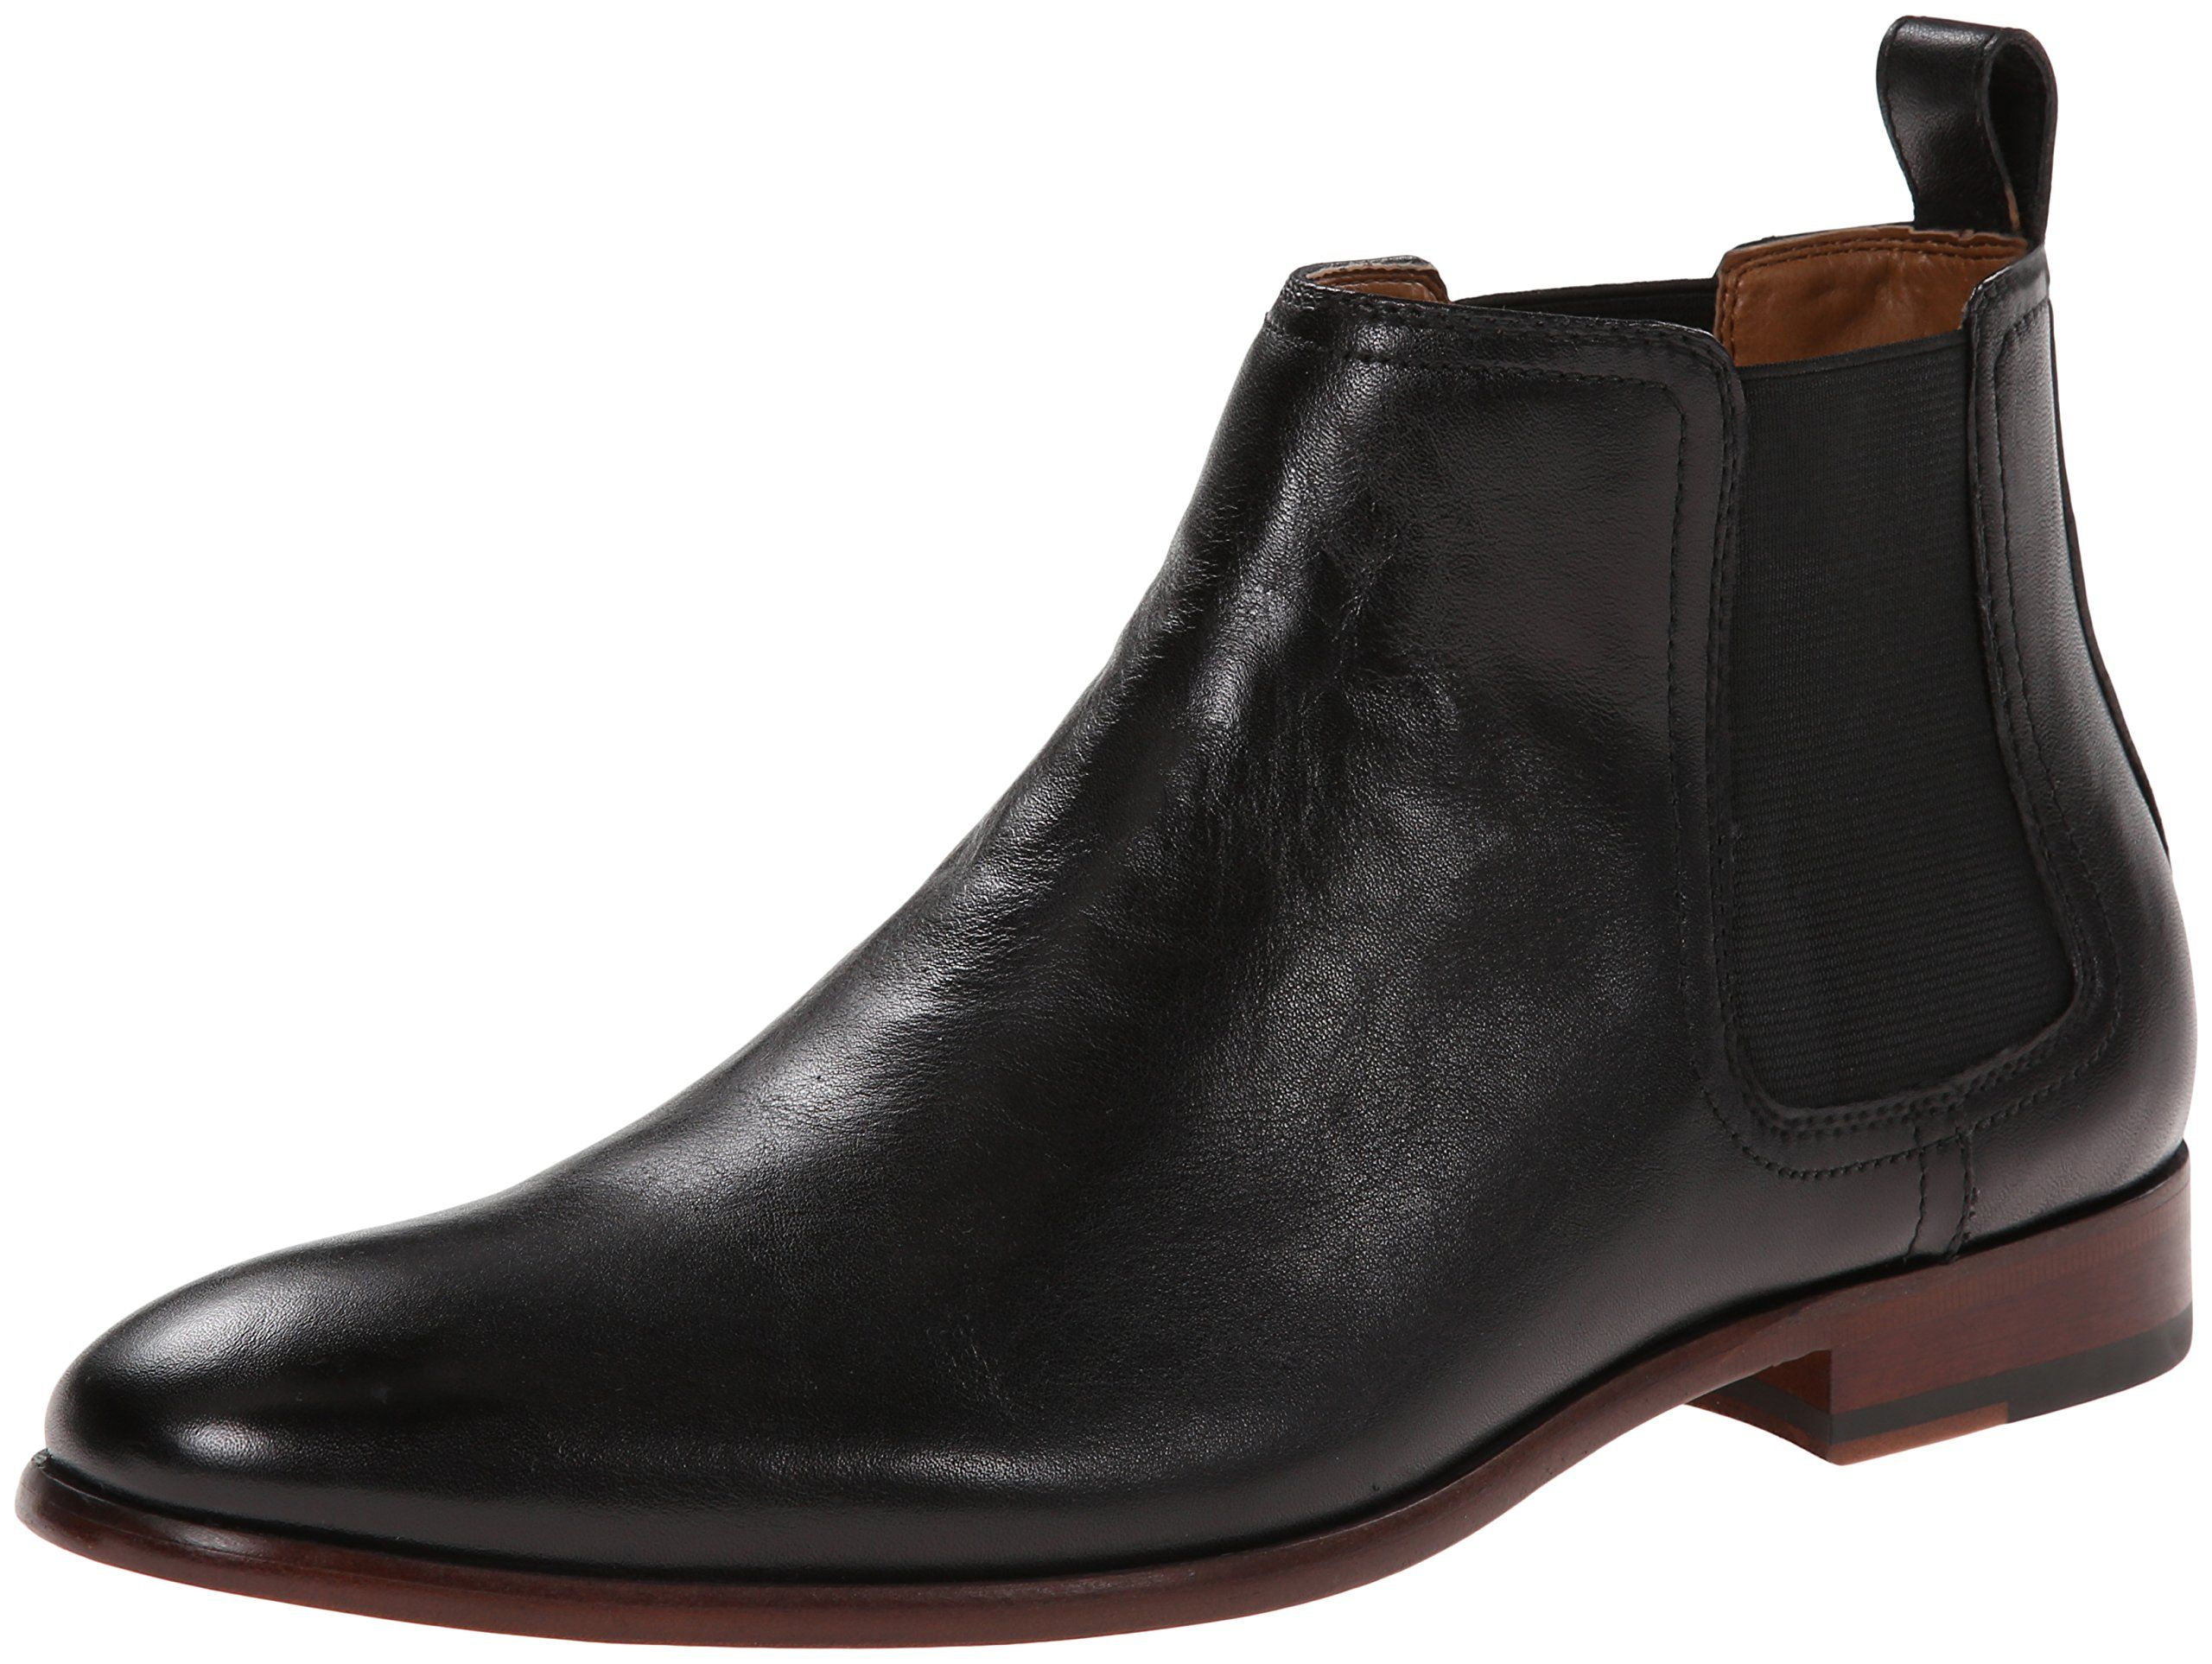 men's aldo boots black leather